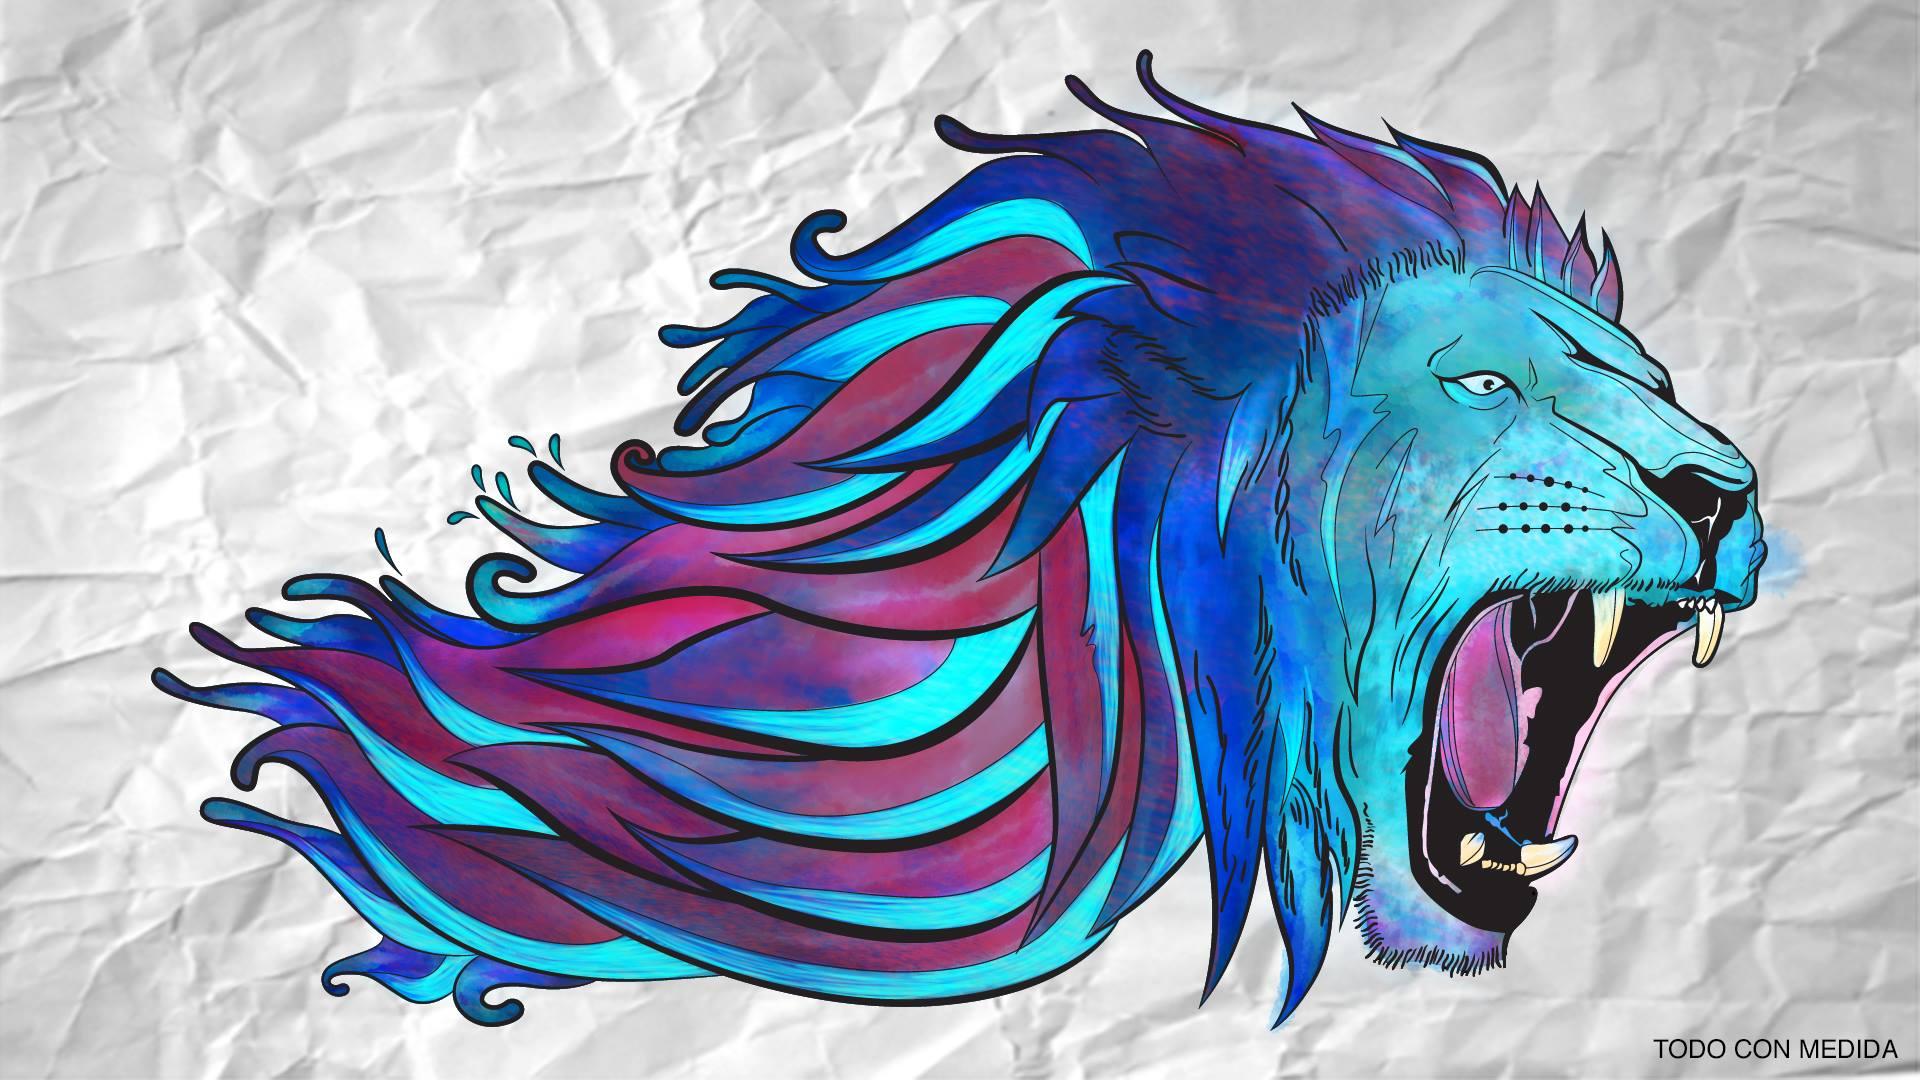 Wallpaper Lion Paper 1920x1080 Elyego 1504403 Hd